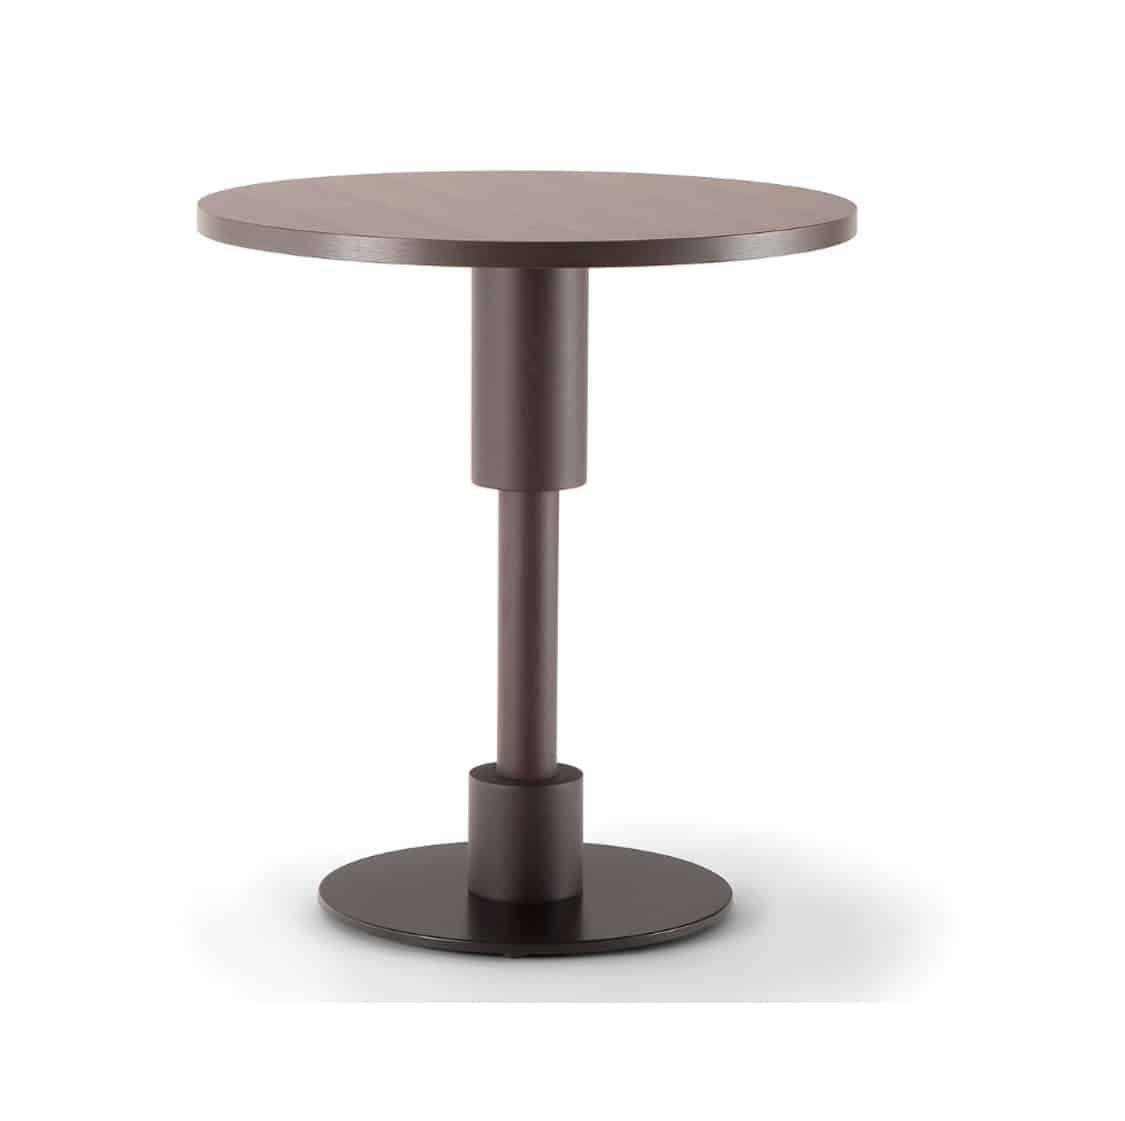 Orlando Table Italian Designer Table DeFrae Contract Furniture